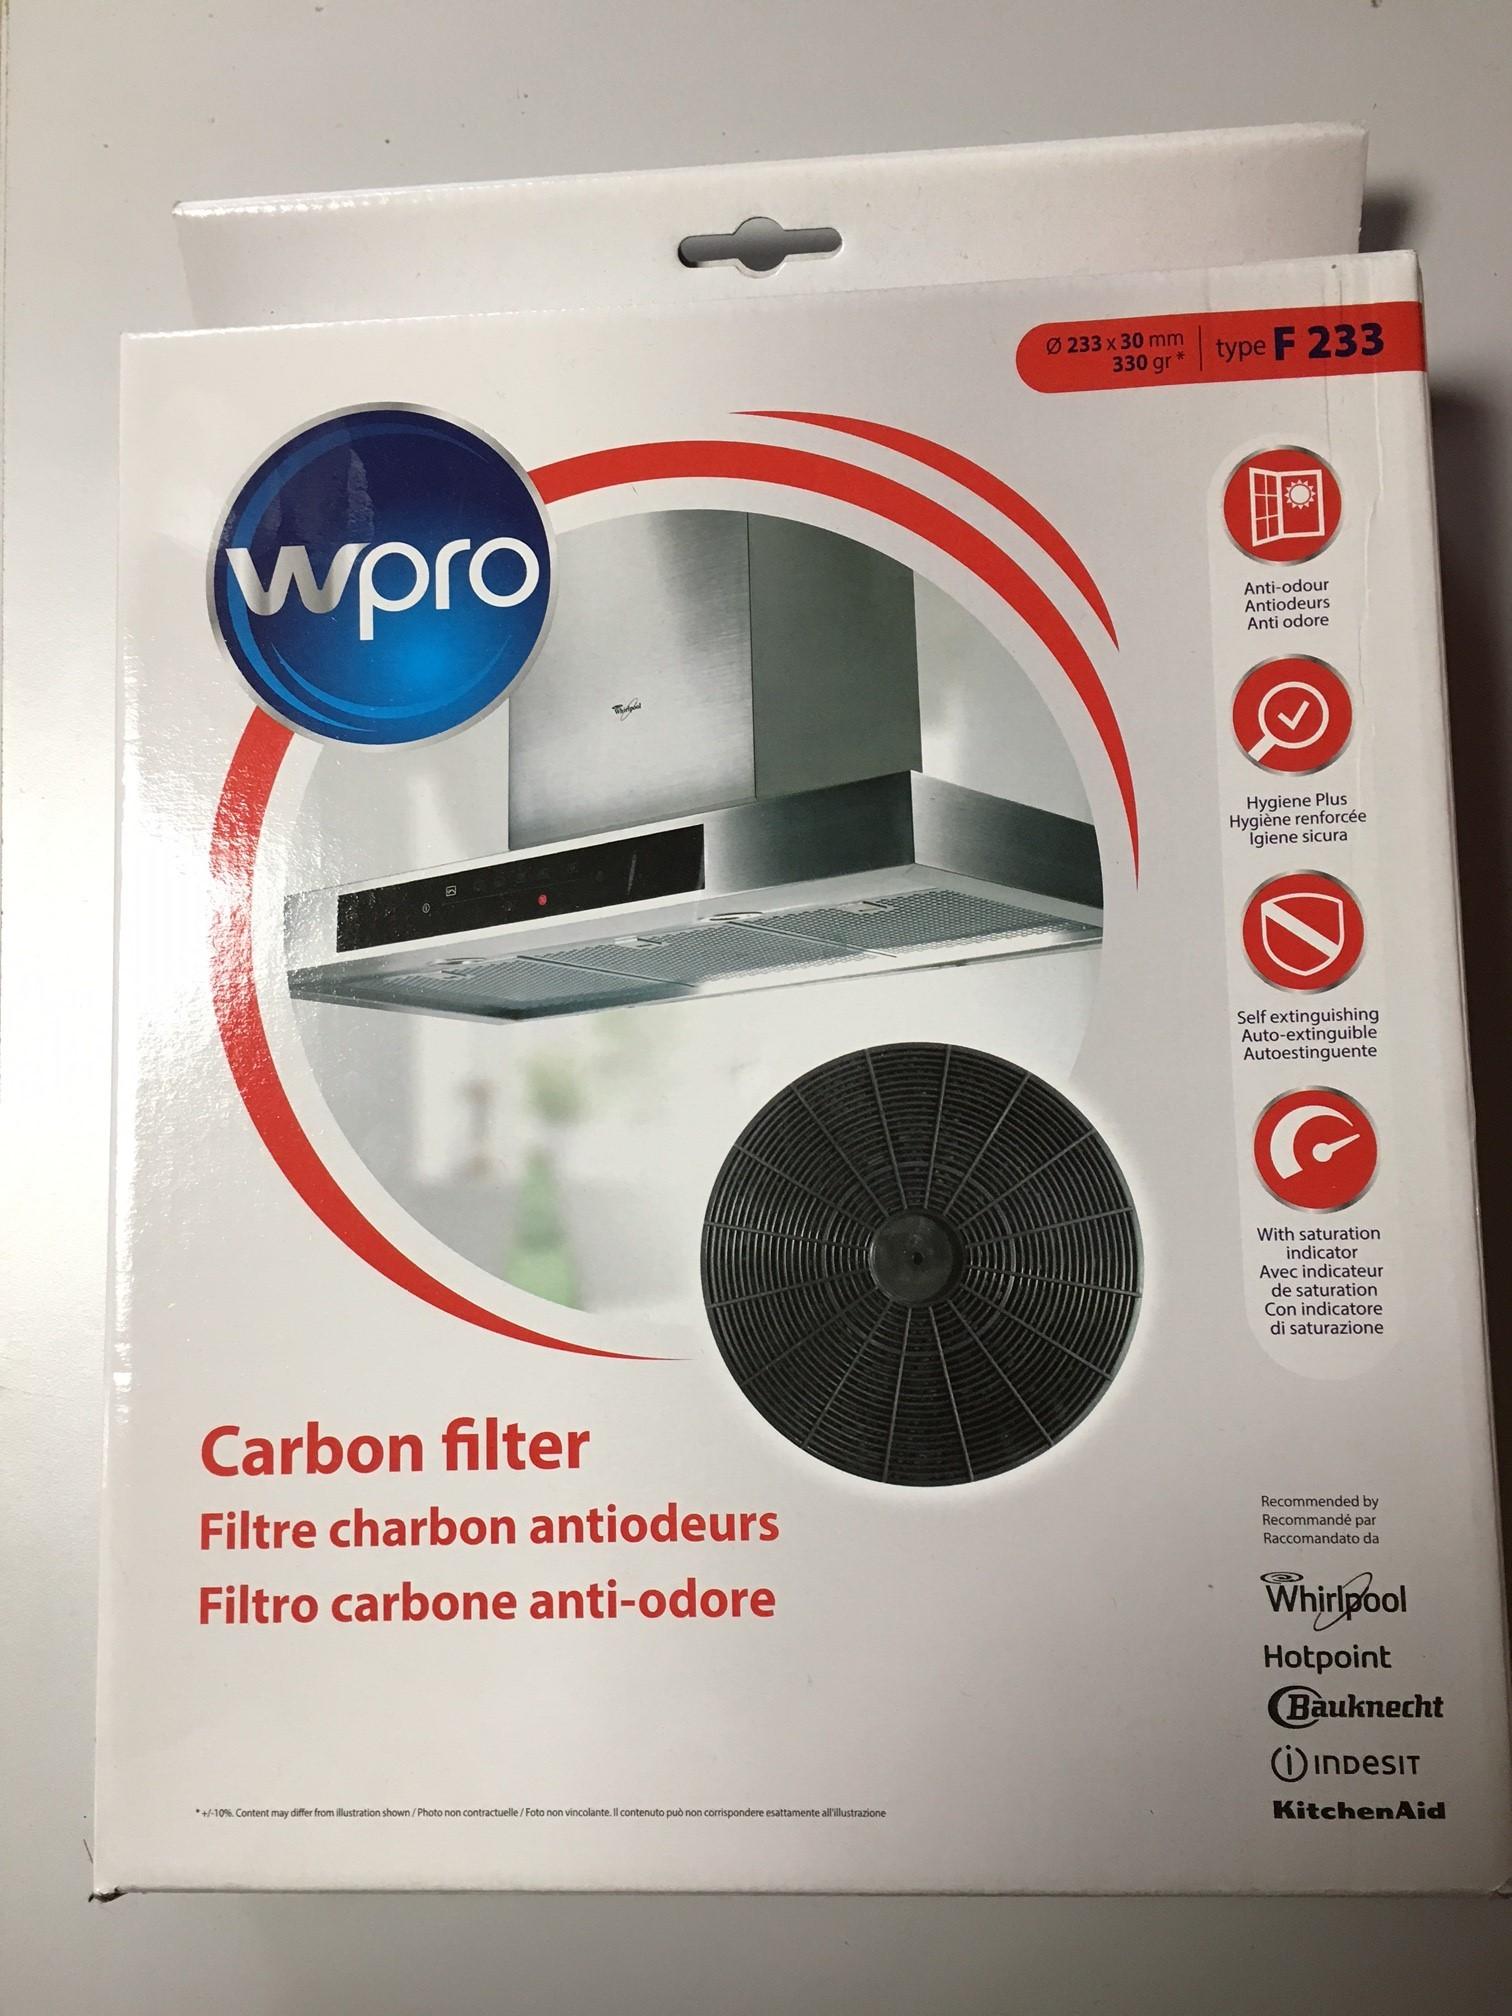 Type F233 carbone charbon hotte filtre